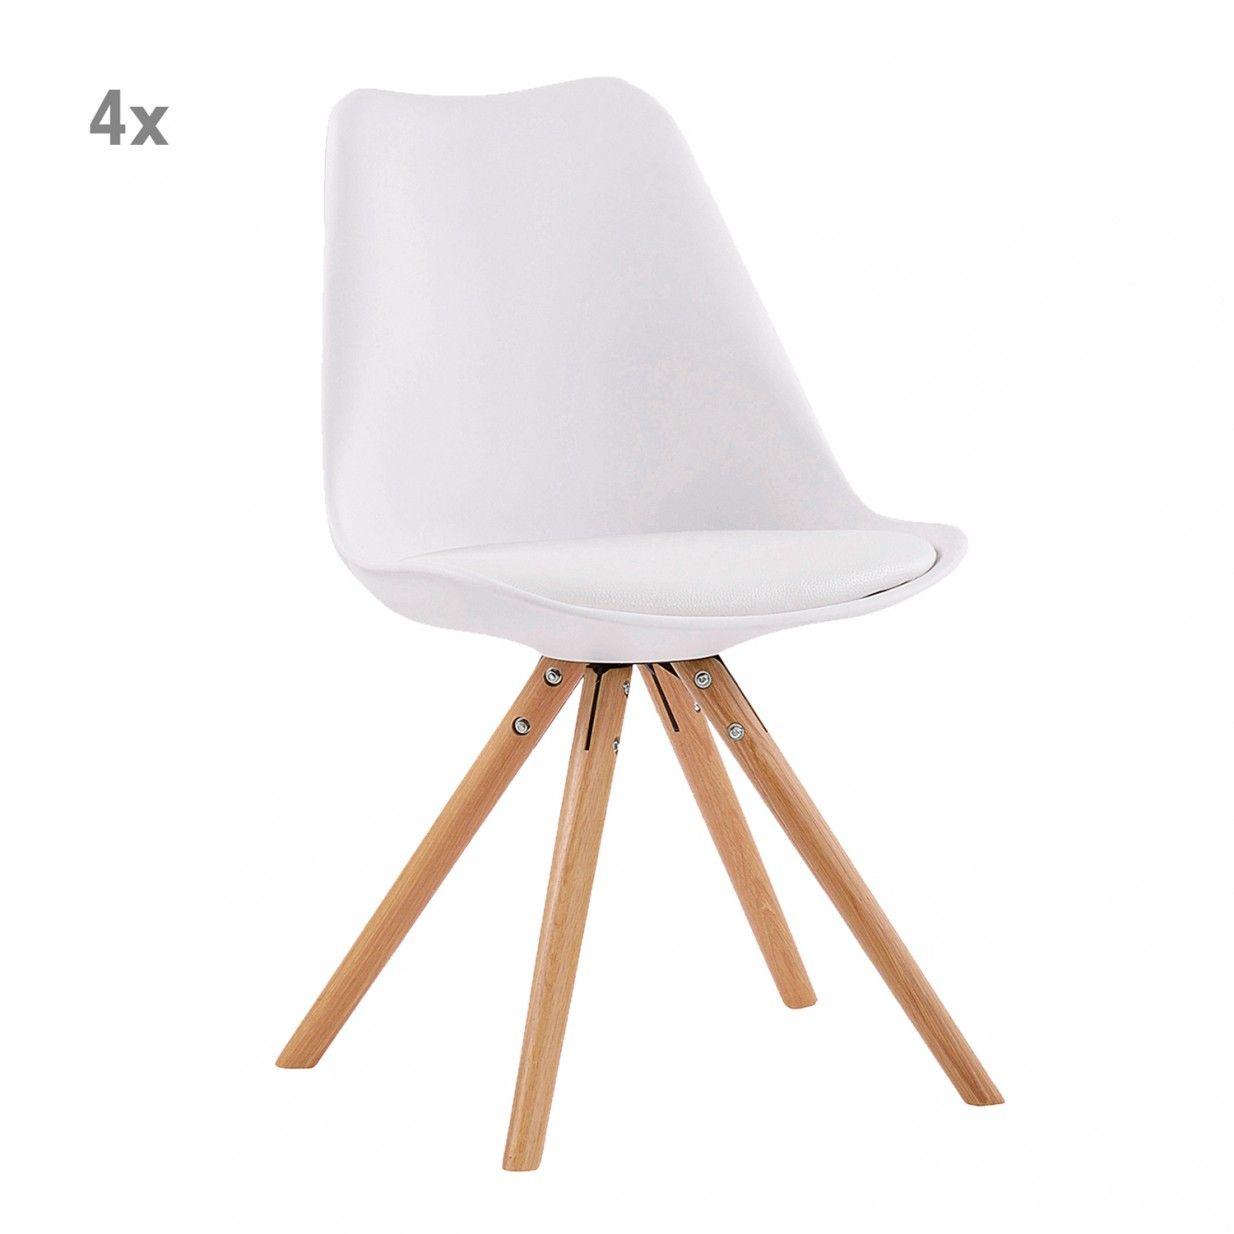 4er-Set Andreas Stühle - Weiß | Swedish Living | interieur design ...